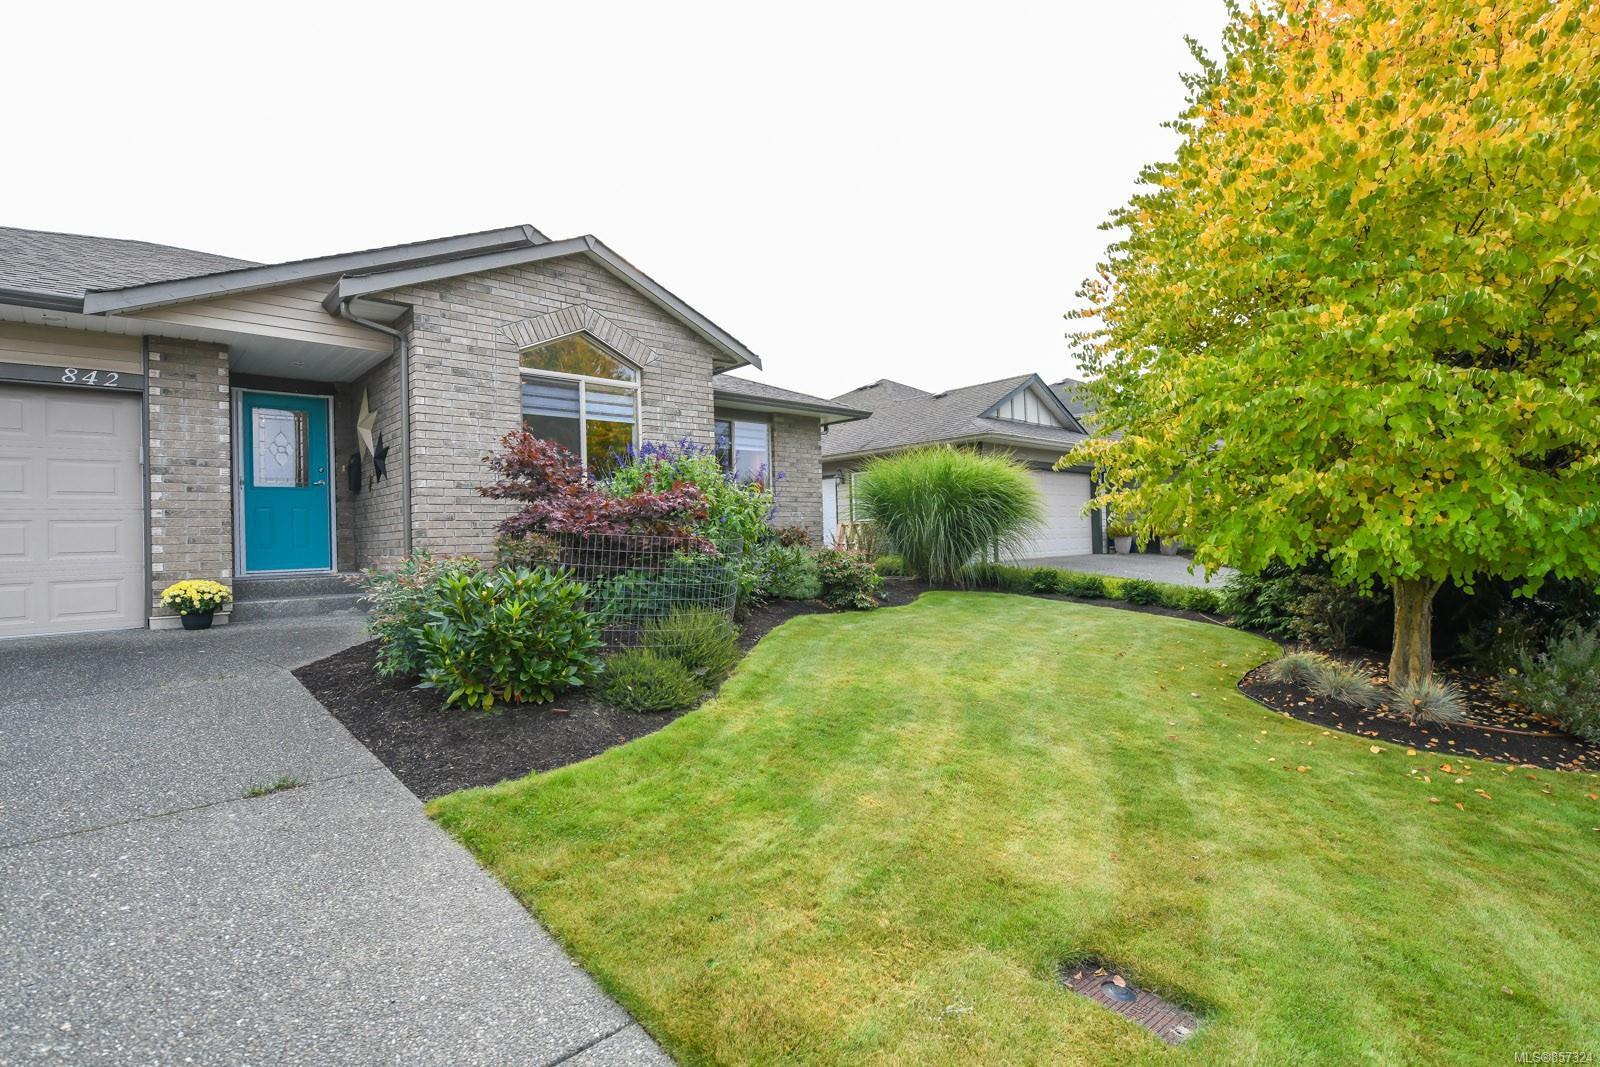 Main Photo: 842 Grumman Pl in : CV Comox (Town of) House for sale (Comox Valley)  : MLS®# 857324